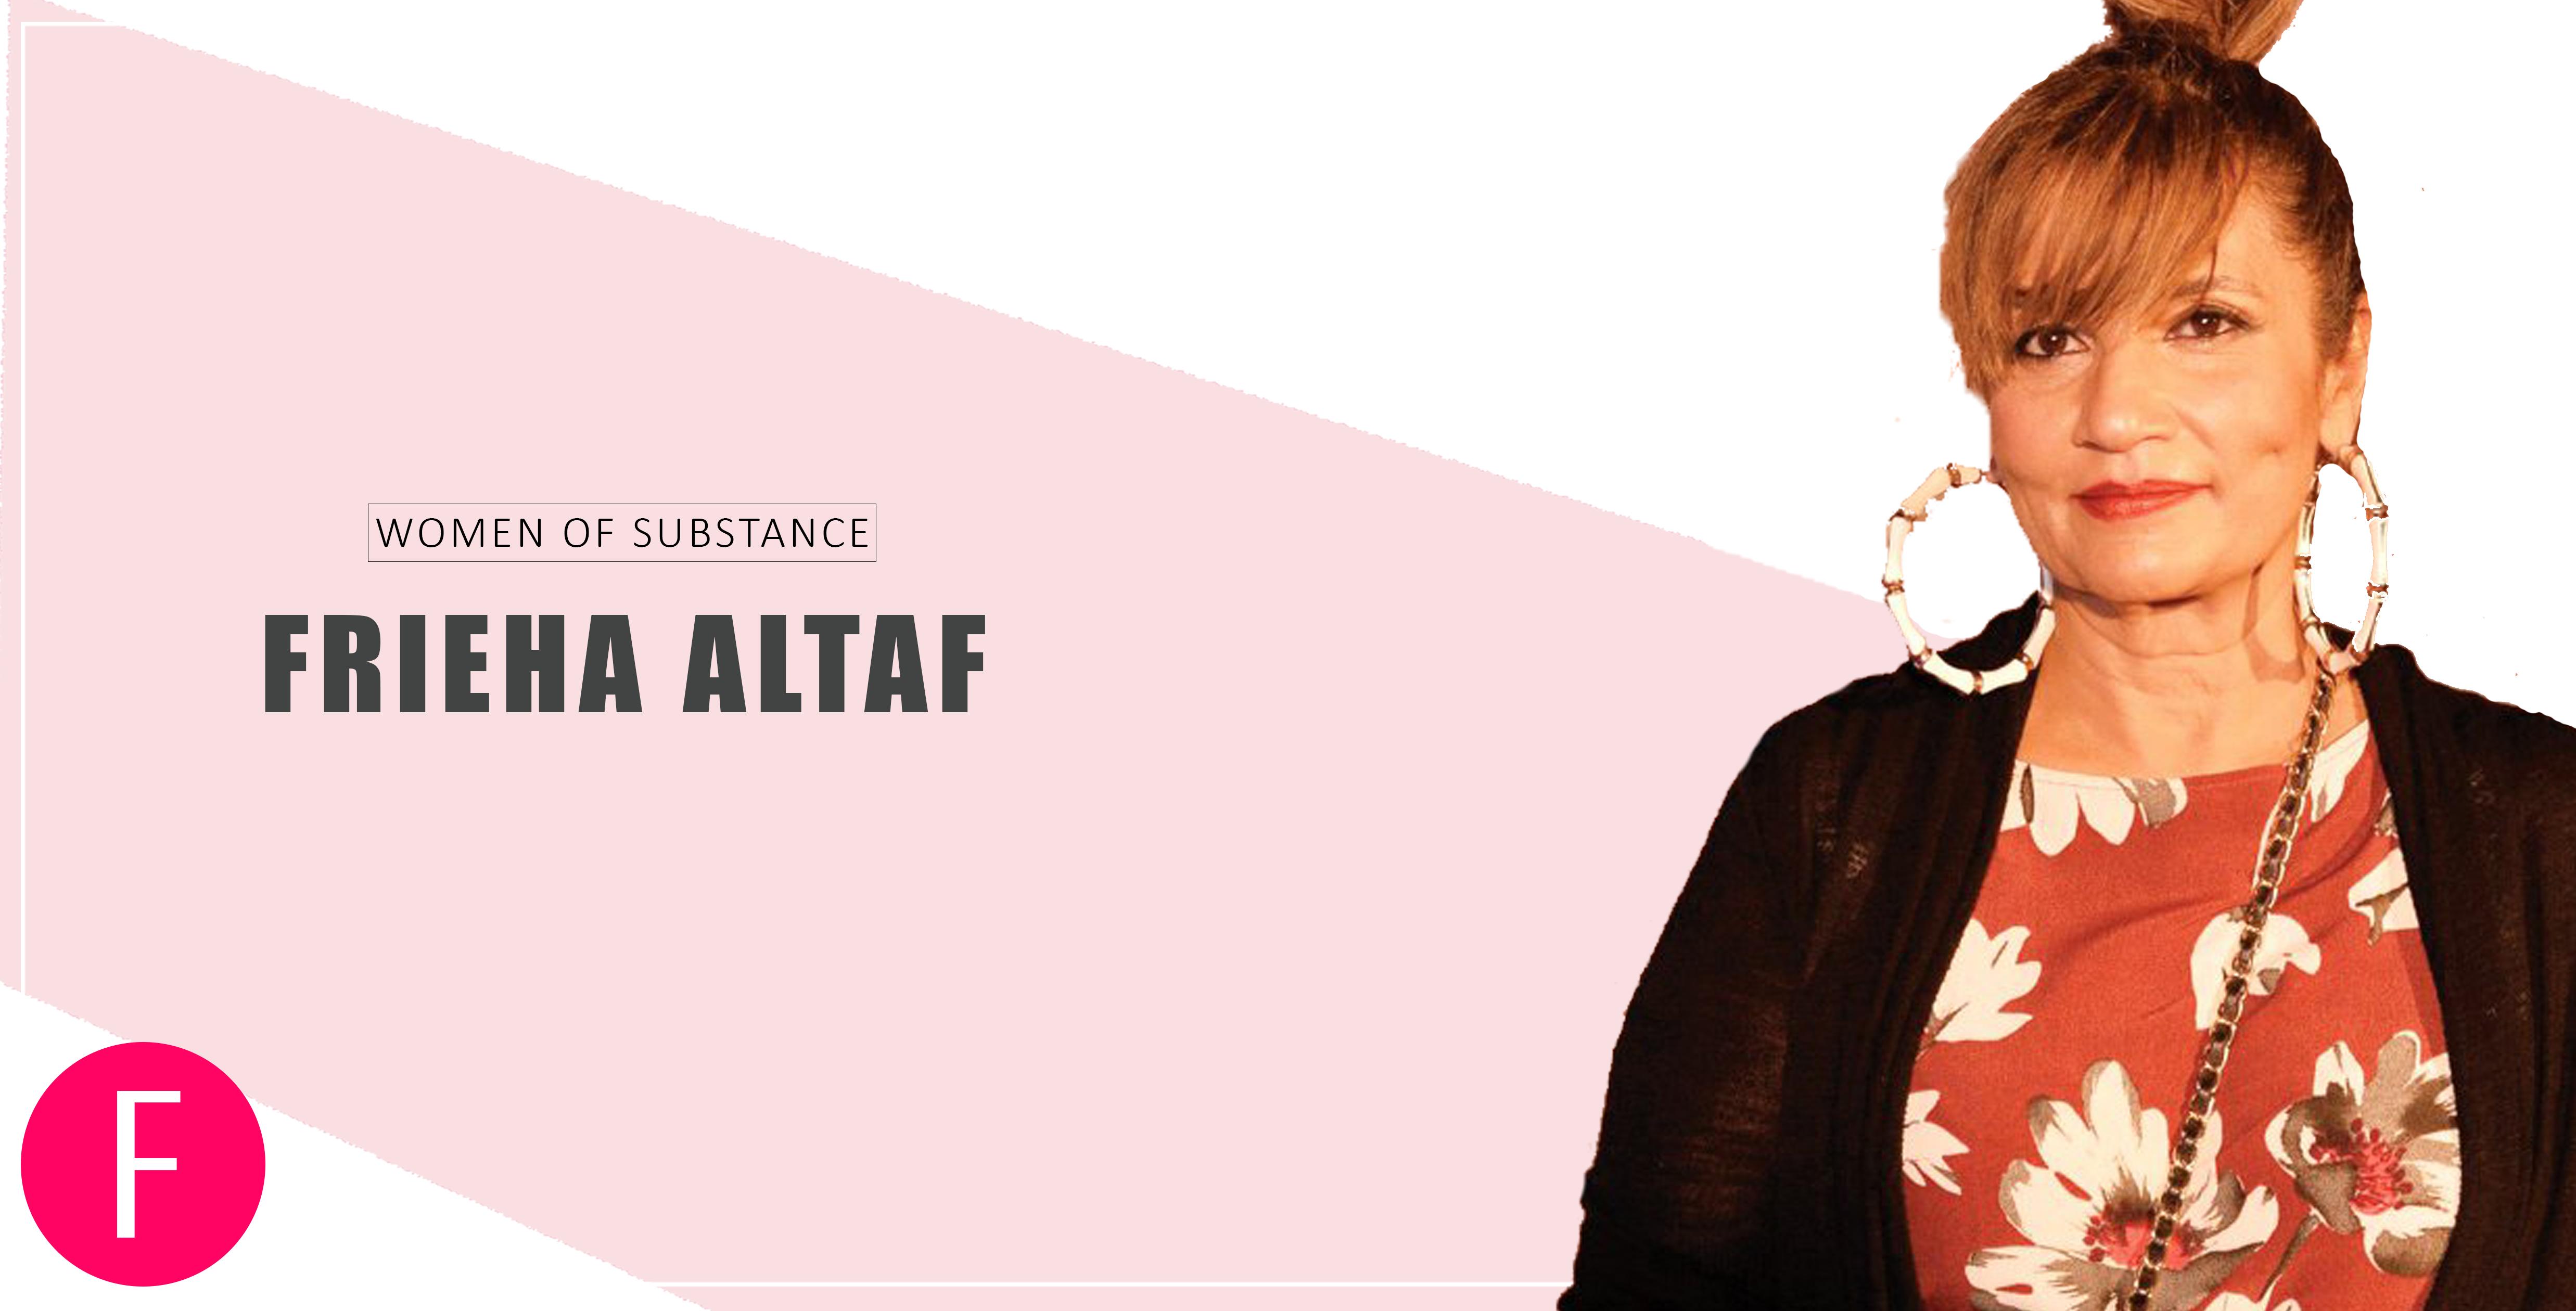 Frieha Altaf